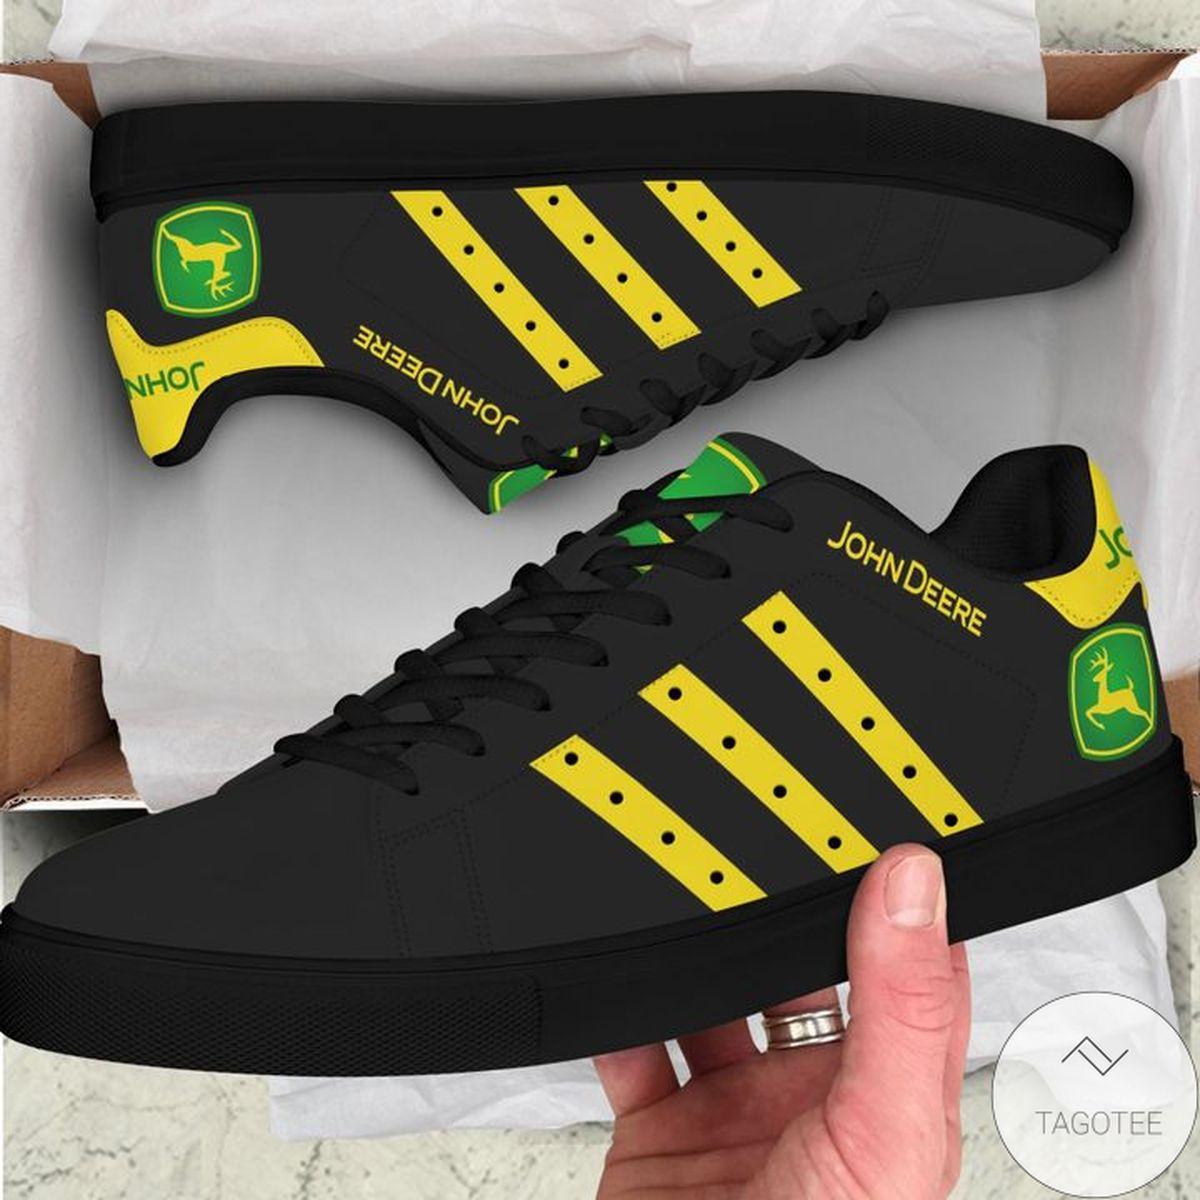 John Deere Black Stan Smith Shoes